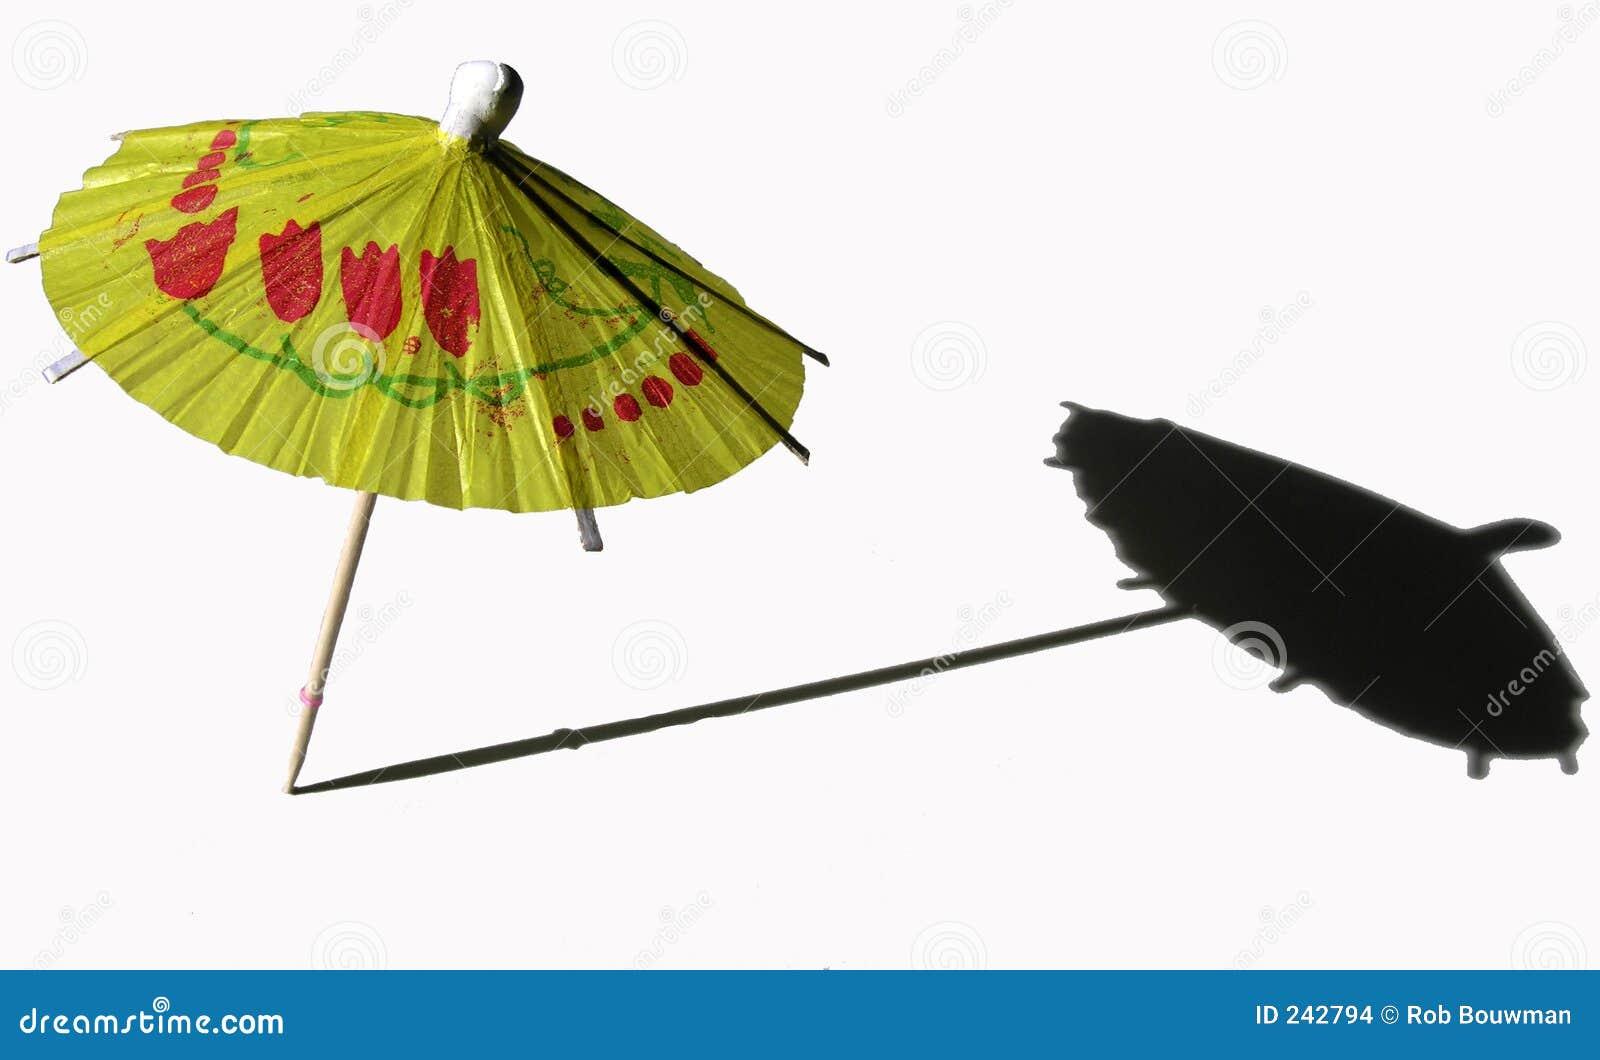 cocktail umbrella stock images image 242794